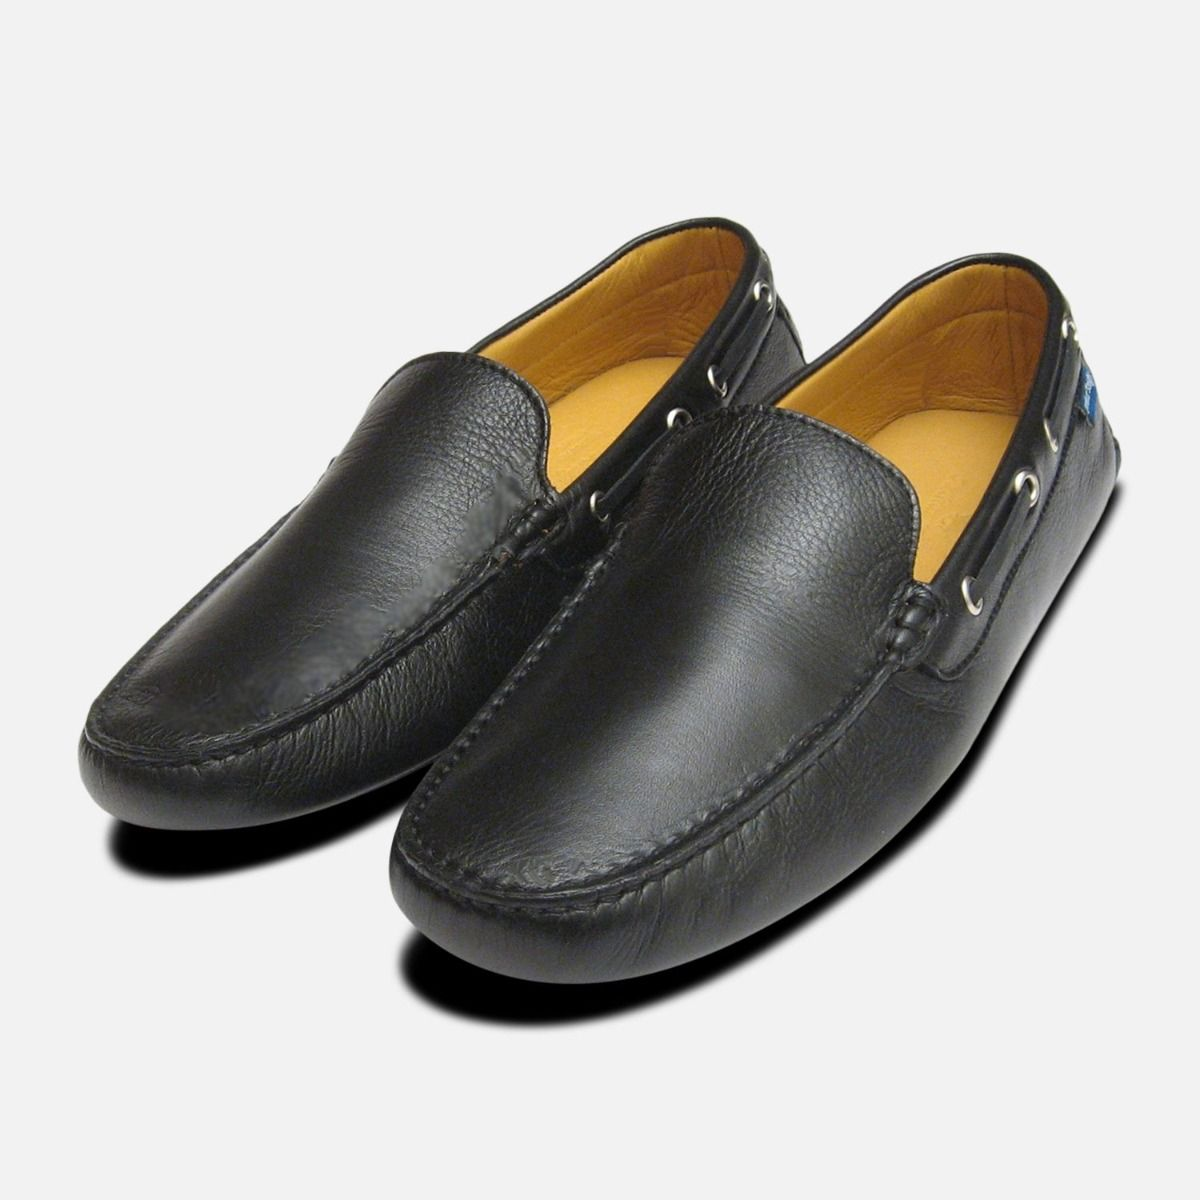 8db2e63b37 Black Calf Leather Italian Driving Shoes for Men by Arthur Knight